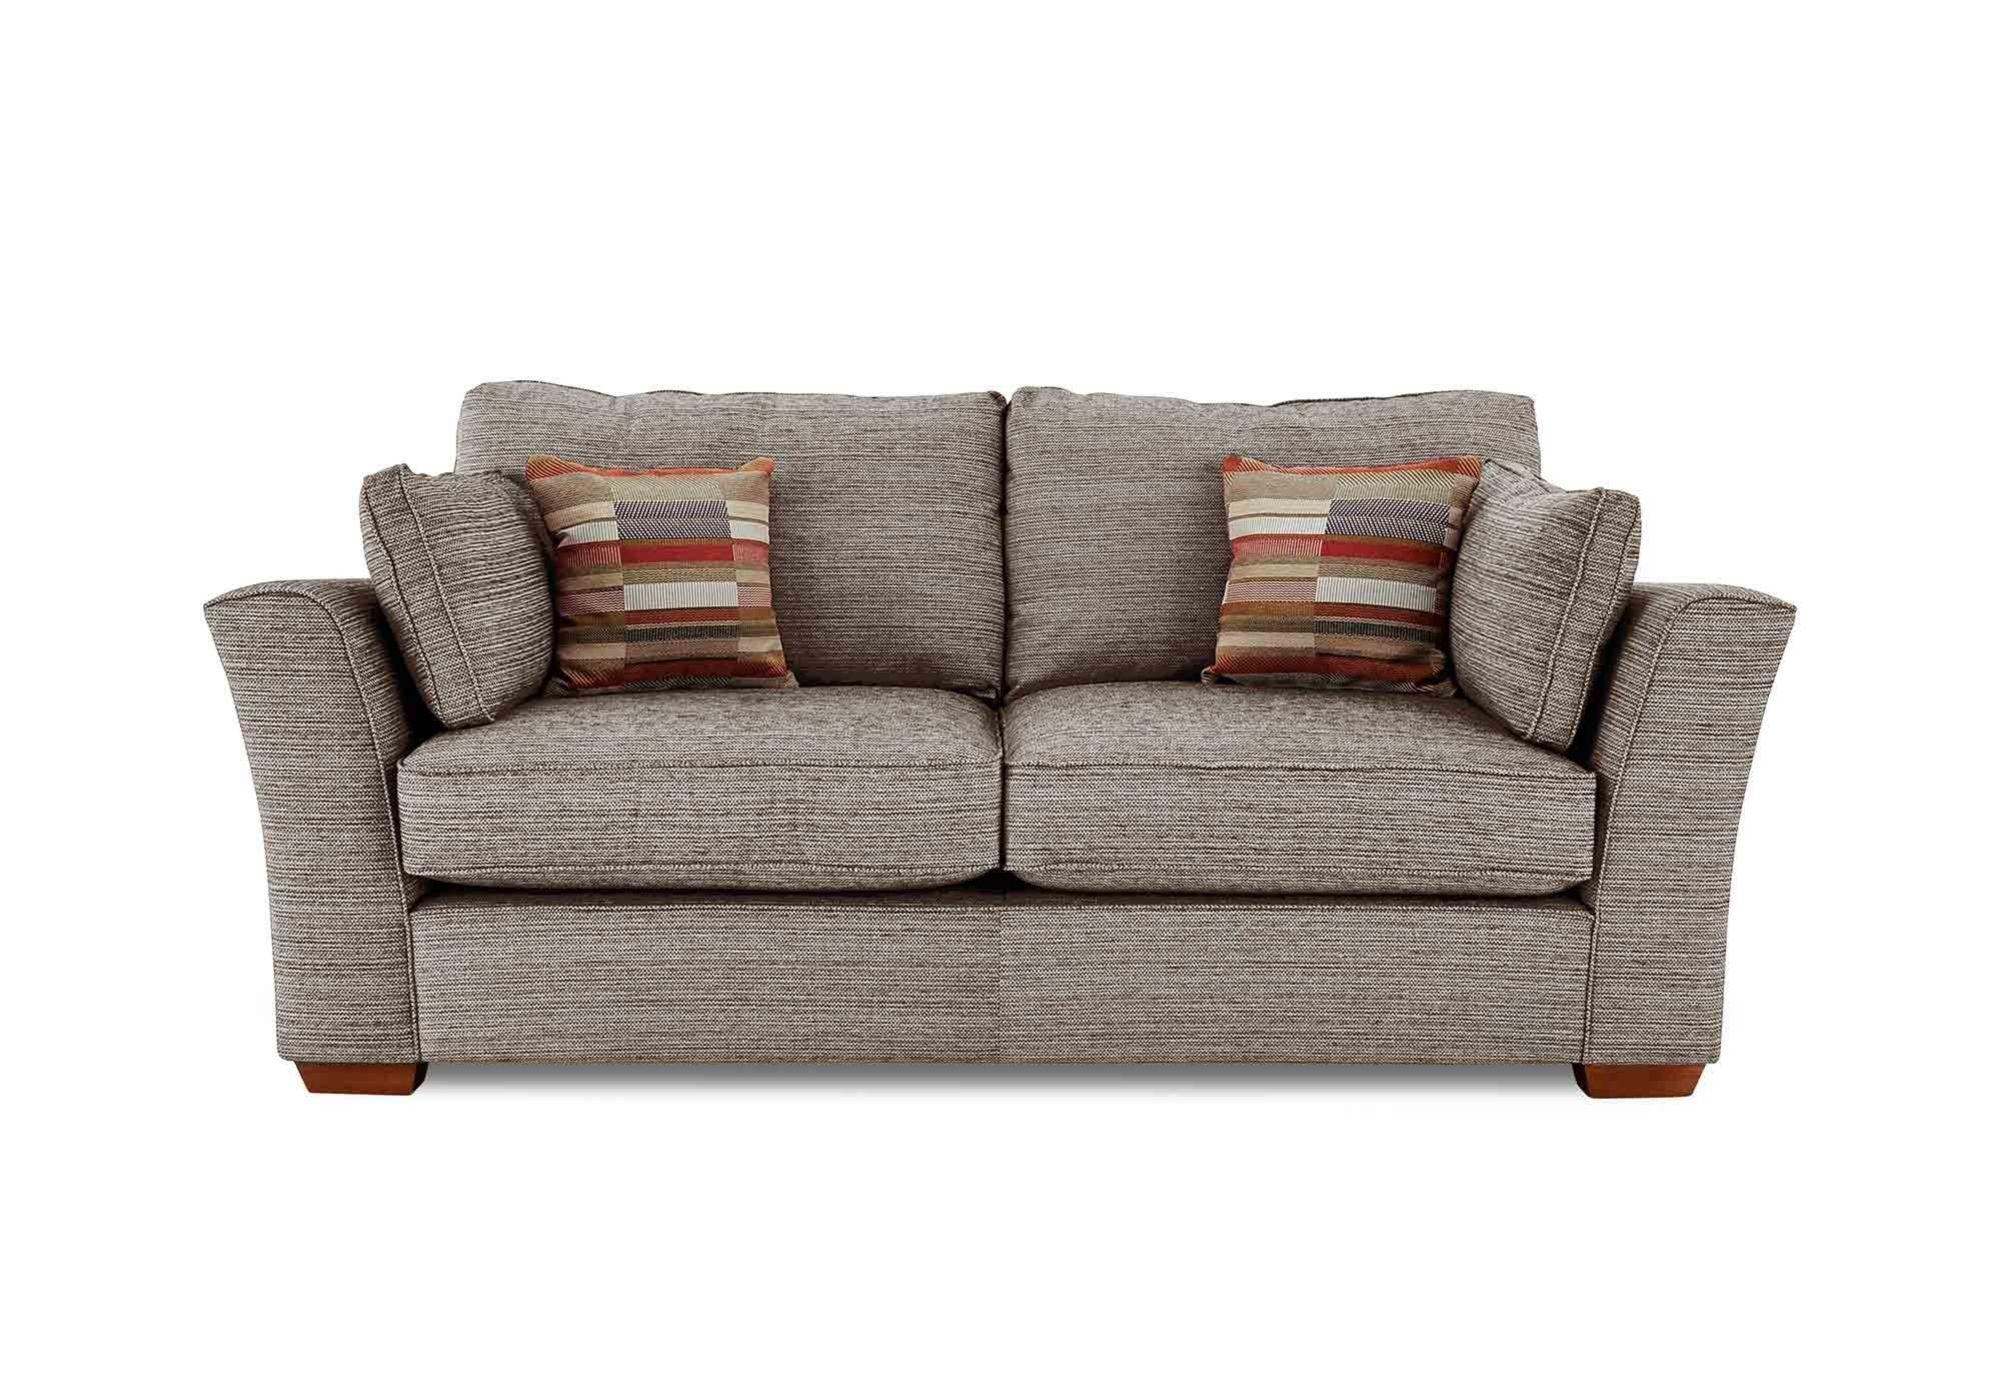 Westbridge Maya U0026 Barton Large Sofa At Furniture Village   Westbridge Maya  U0026 Barton Upholstery At